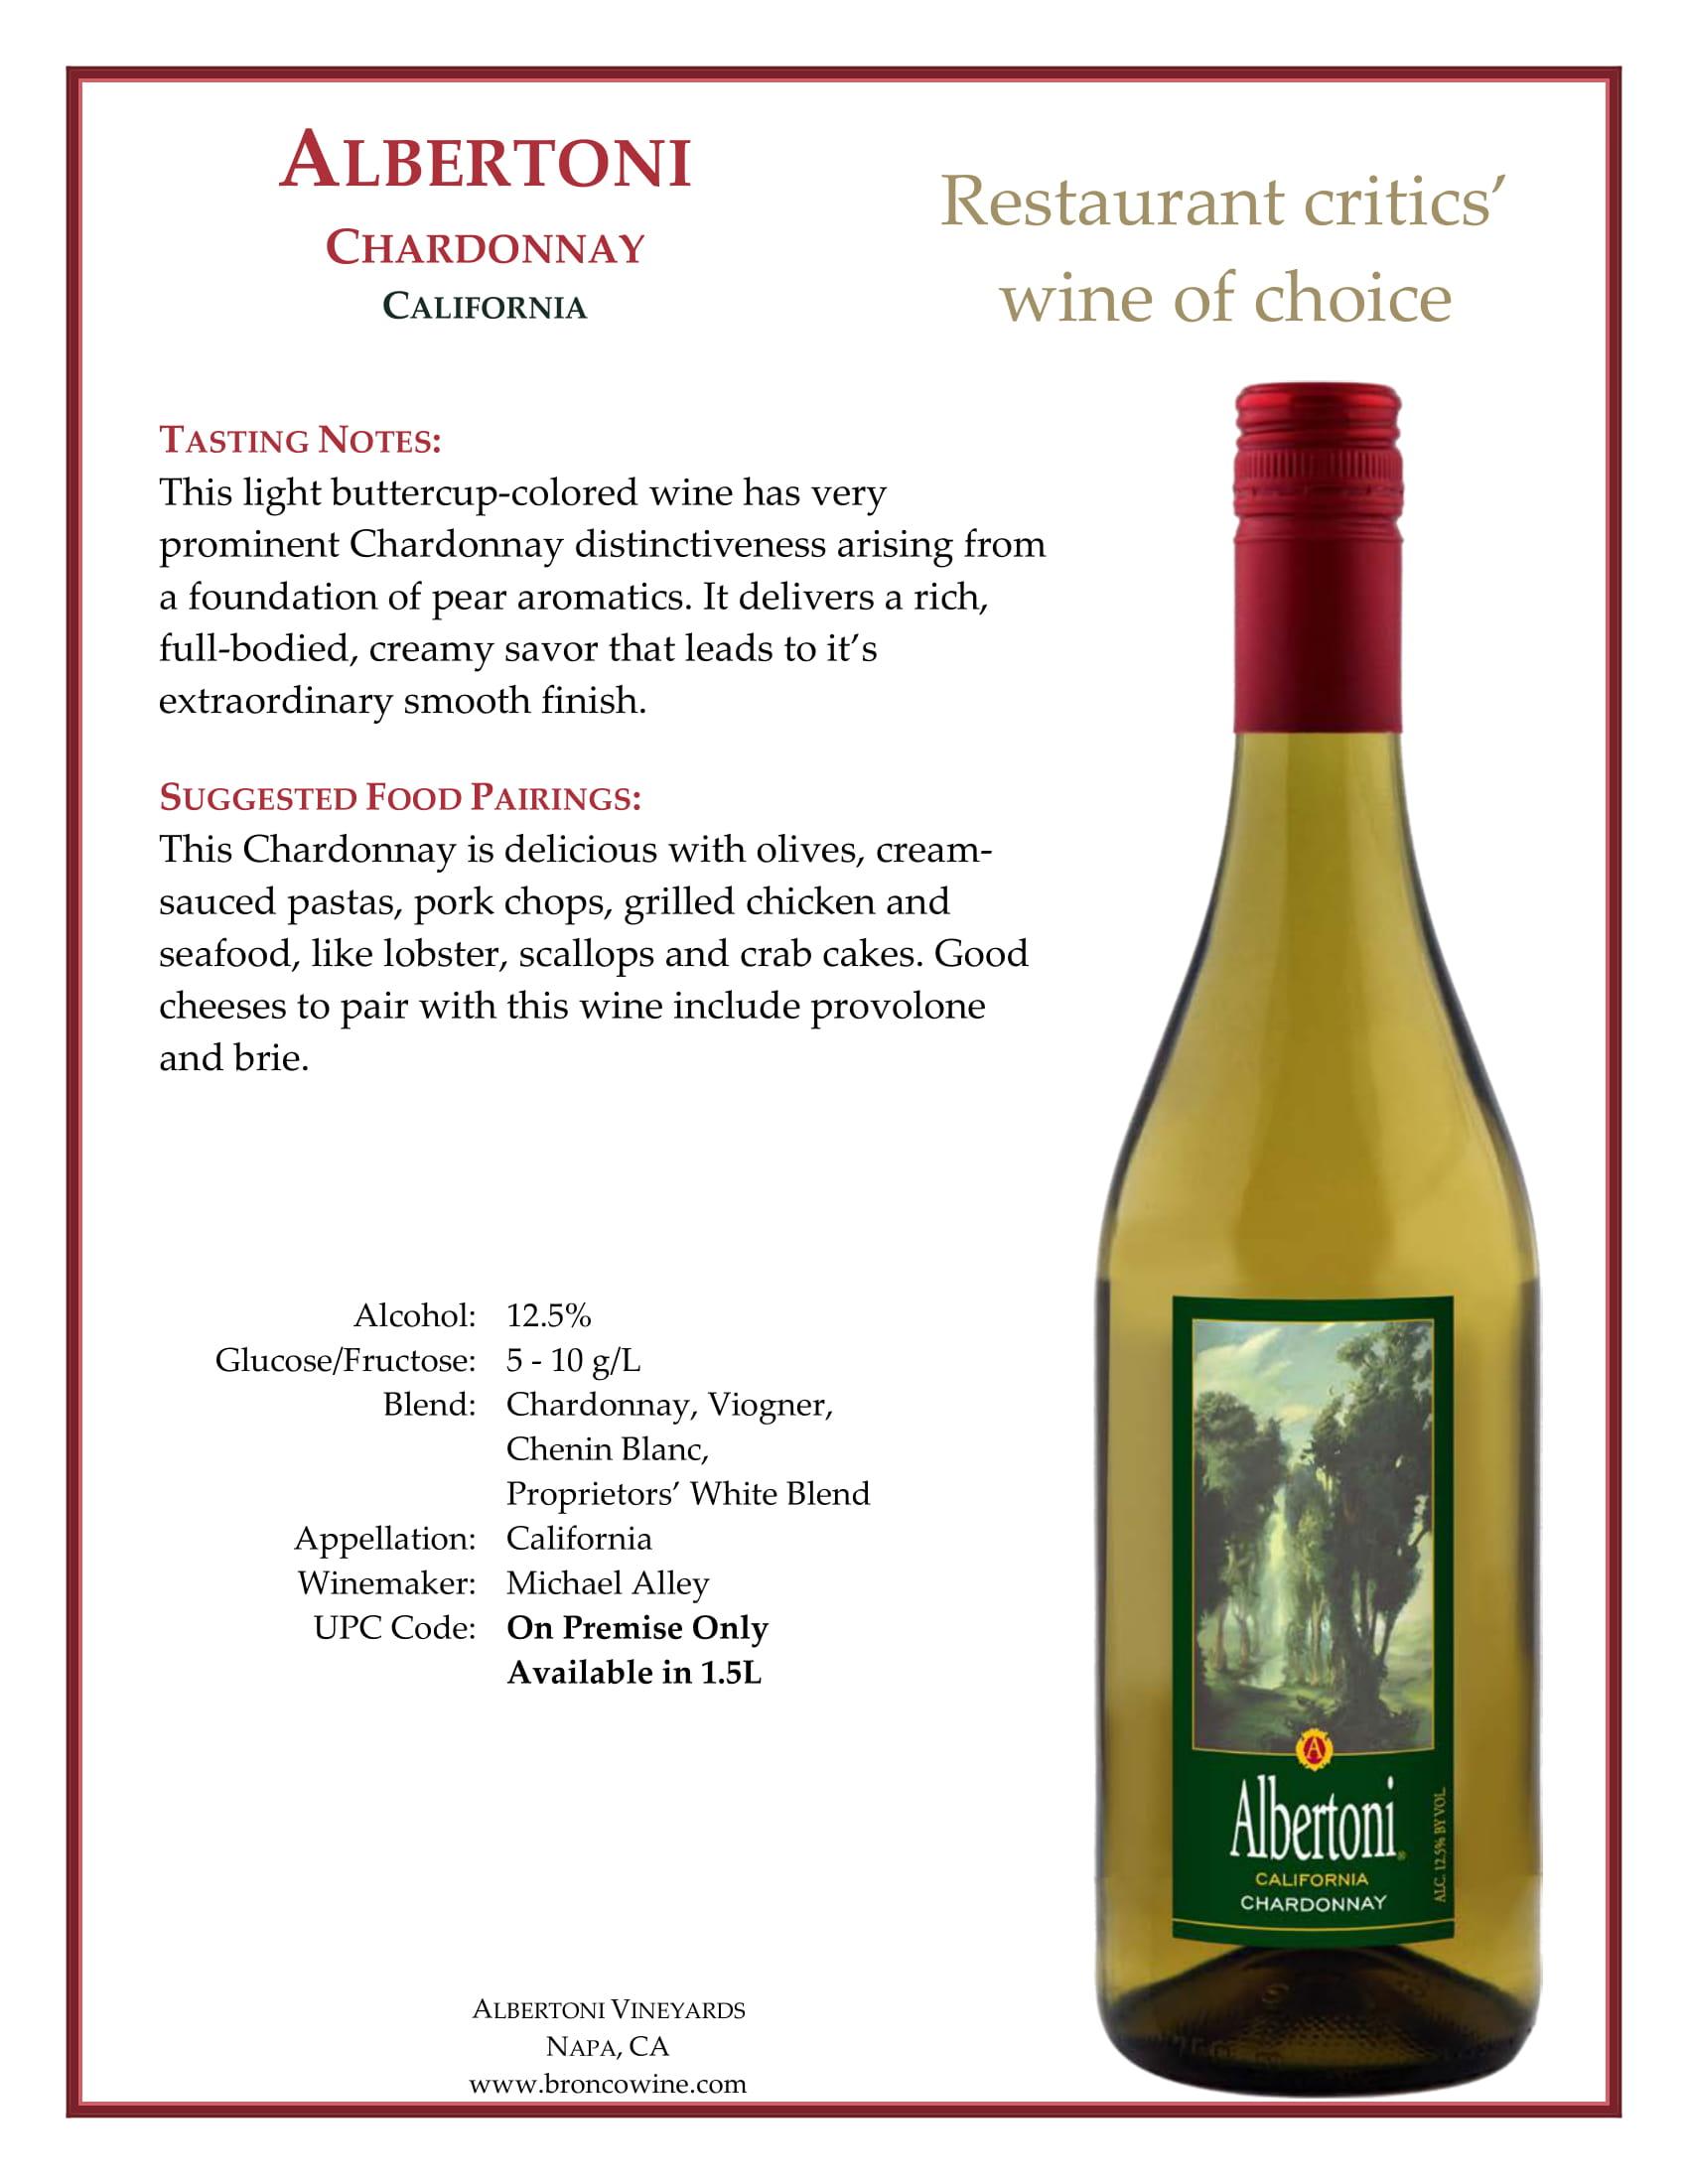 Albertoni Chardonnay Tech Sheet